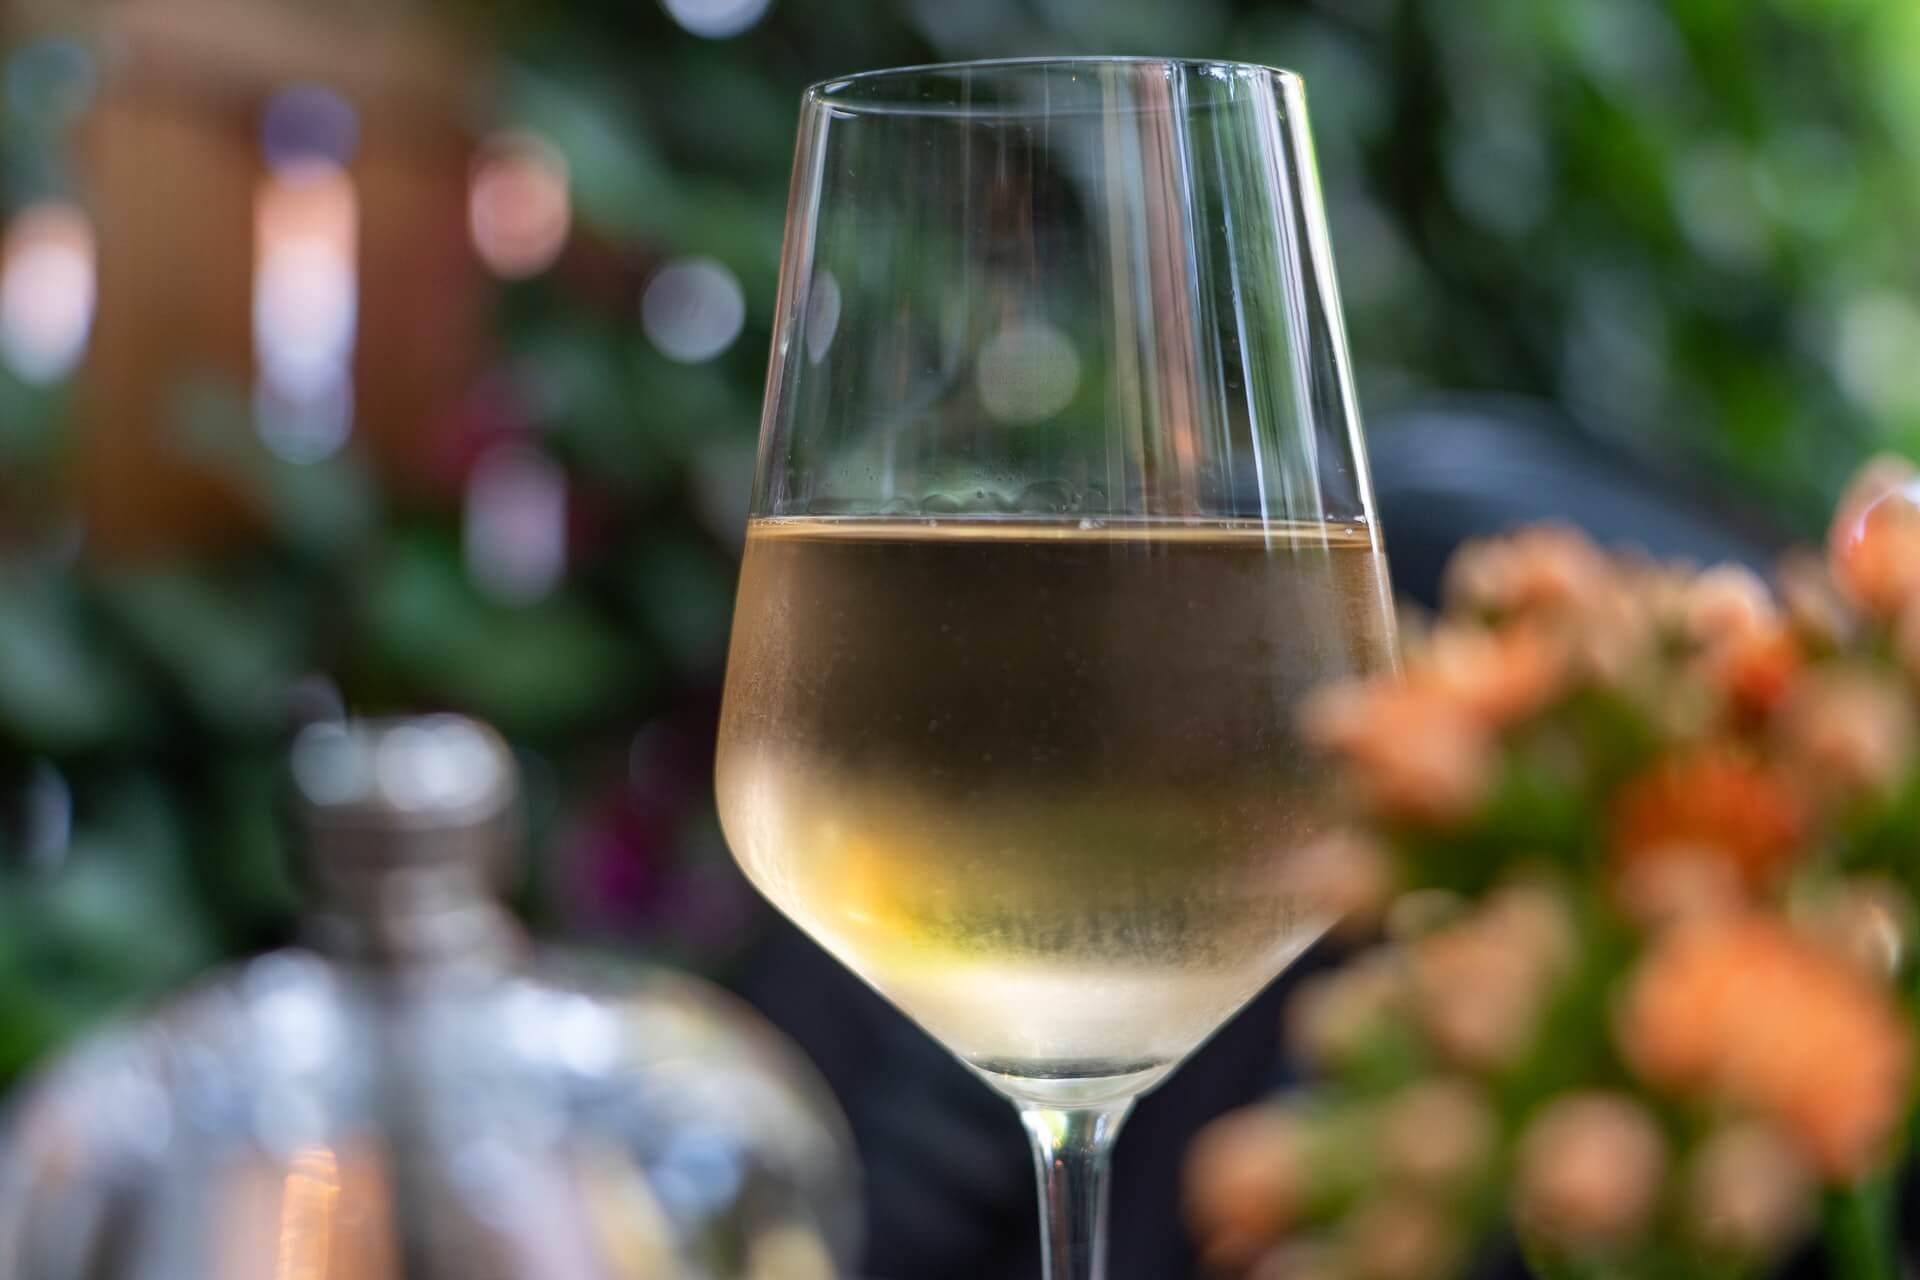 white wine in a glass to remove carpet stain